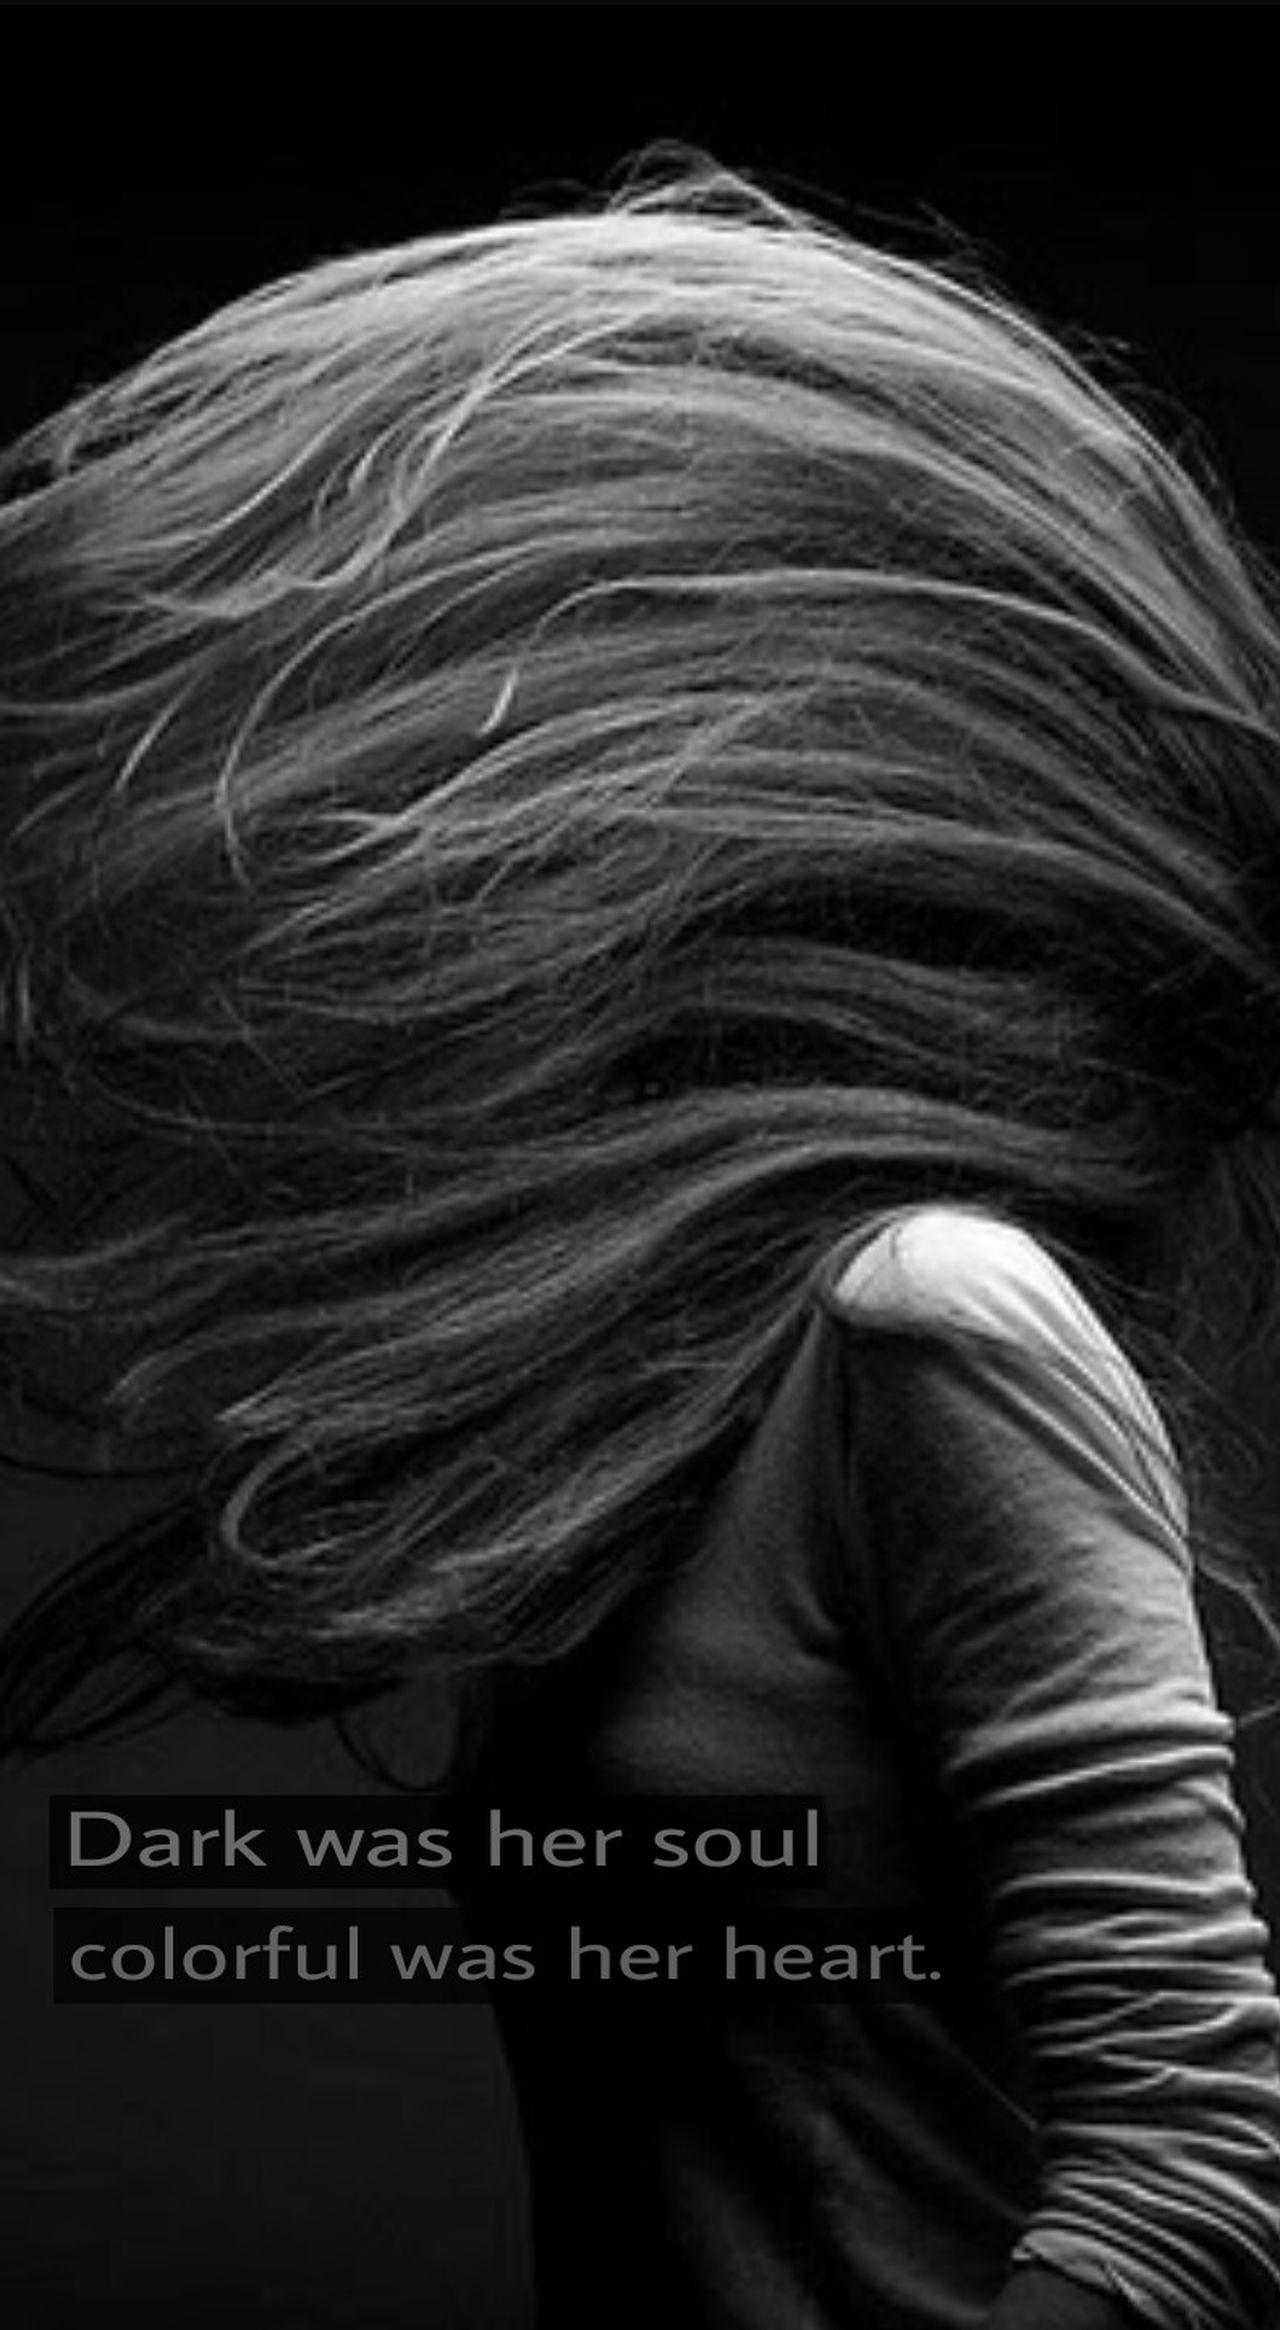 Darkpath B&w Darkthoughts Brokensoul Blackandwhite Lonelymountain Loneliness Lost Feelinglost Memories Lostplaces Black Sadpoetry Darkness And Light